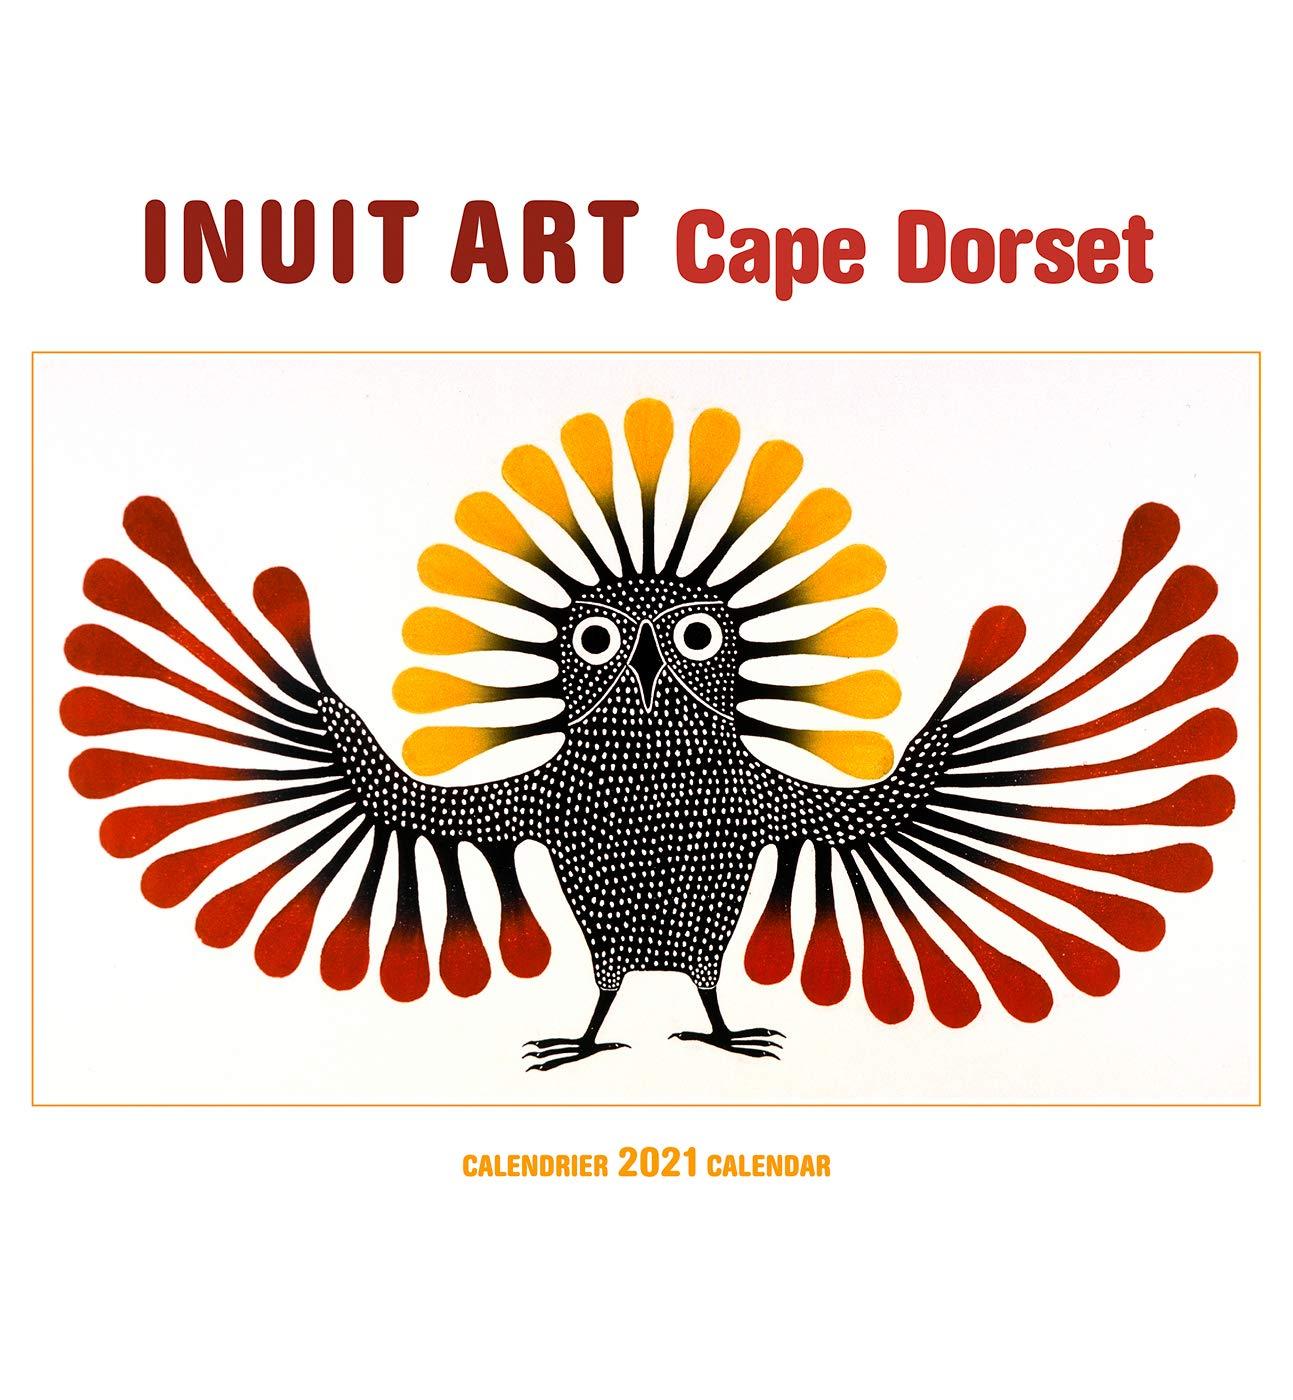 Buy Inuit Art Cape Dorset Calendrier 2021 Calendar Book Online at